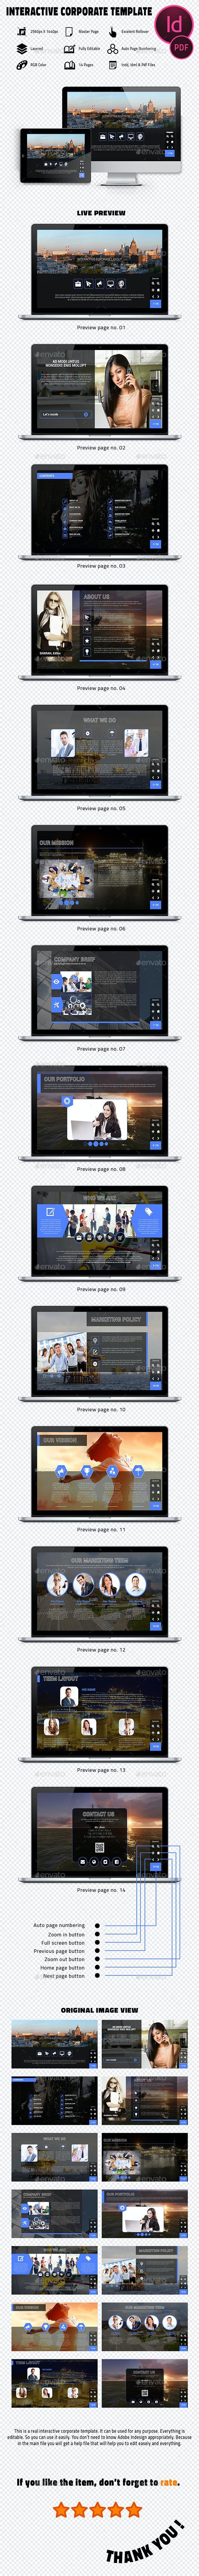 Interactive Corporate Template - Digital Magazines ePublishing